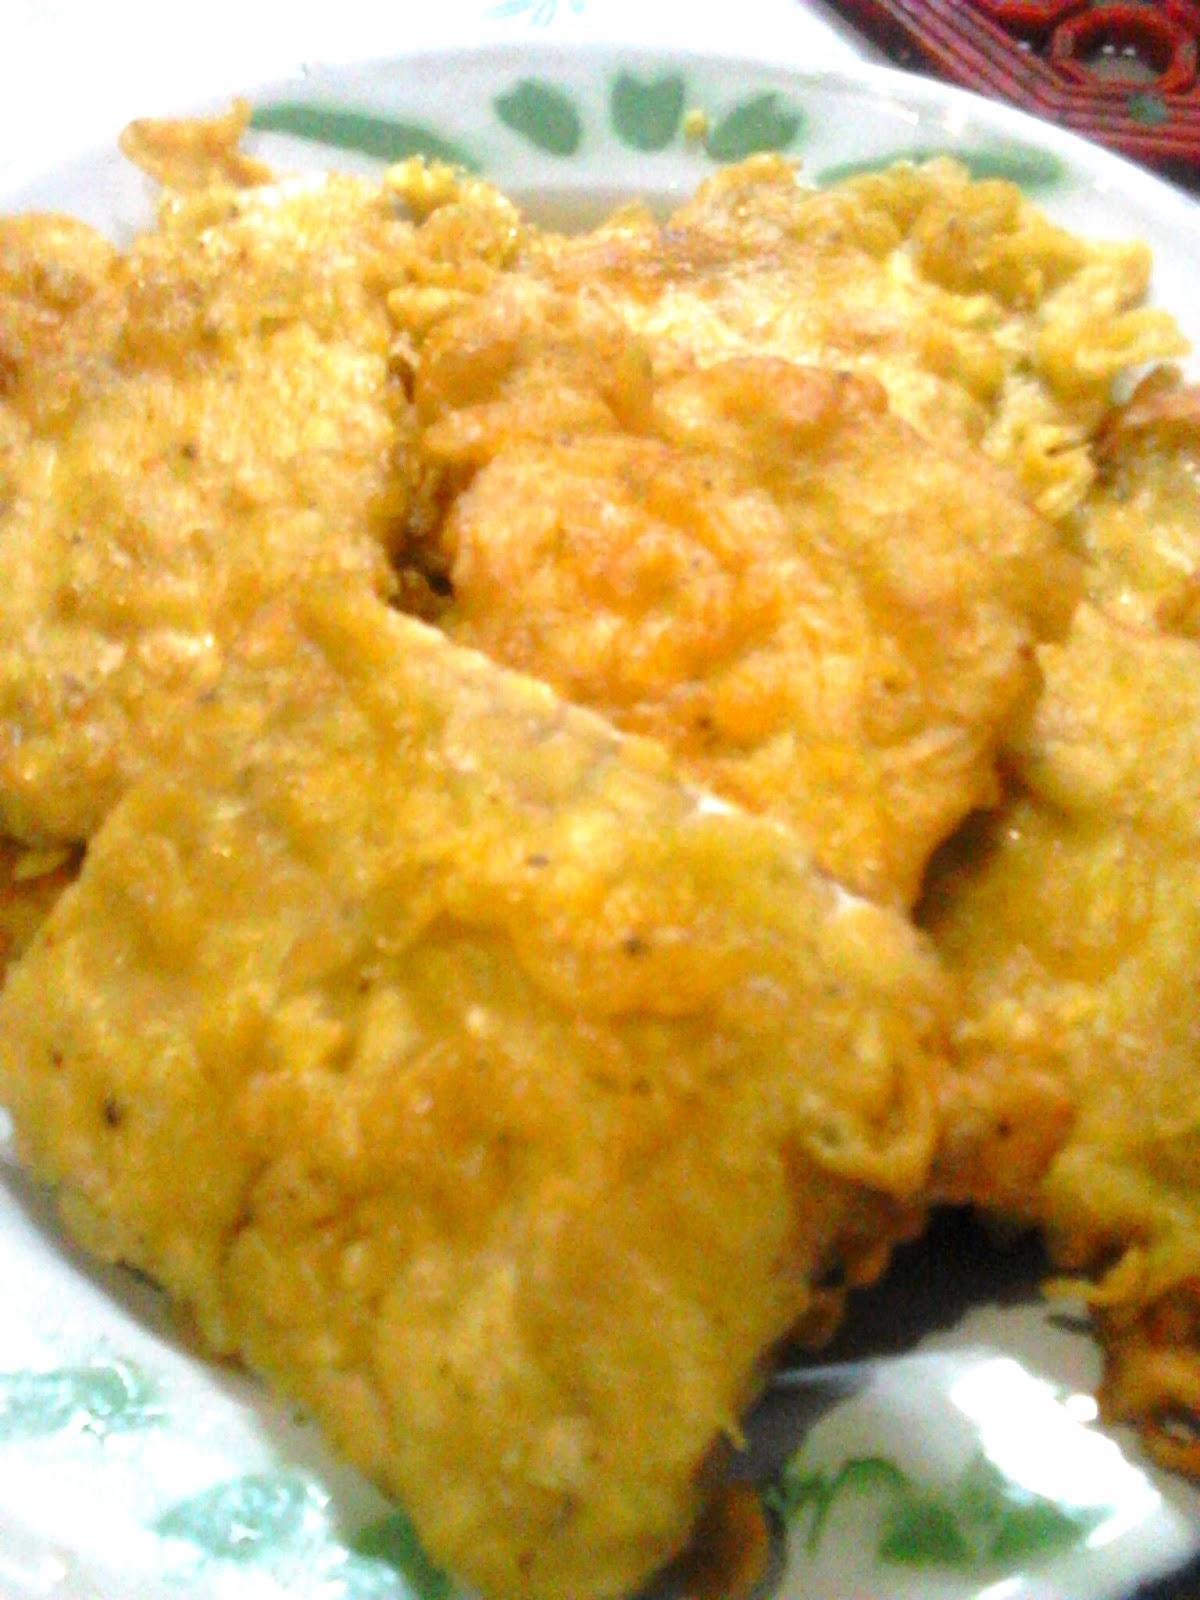 Resep Gorengan Tempe : resep, gorengan, tempe, Indonesian, Foods, Beverages:, RESEP, TEMPE, GORENG, TEPUNG, RUMAHAN